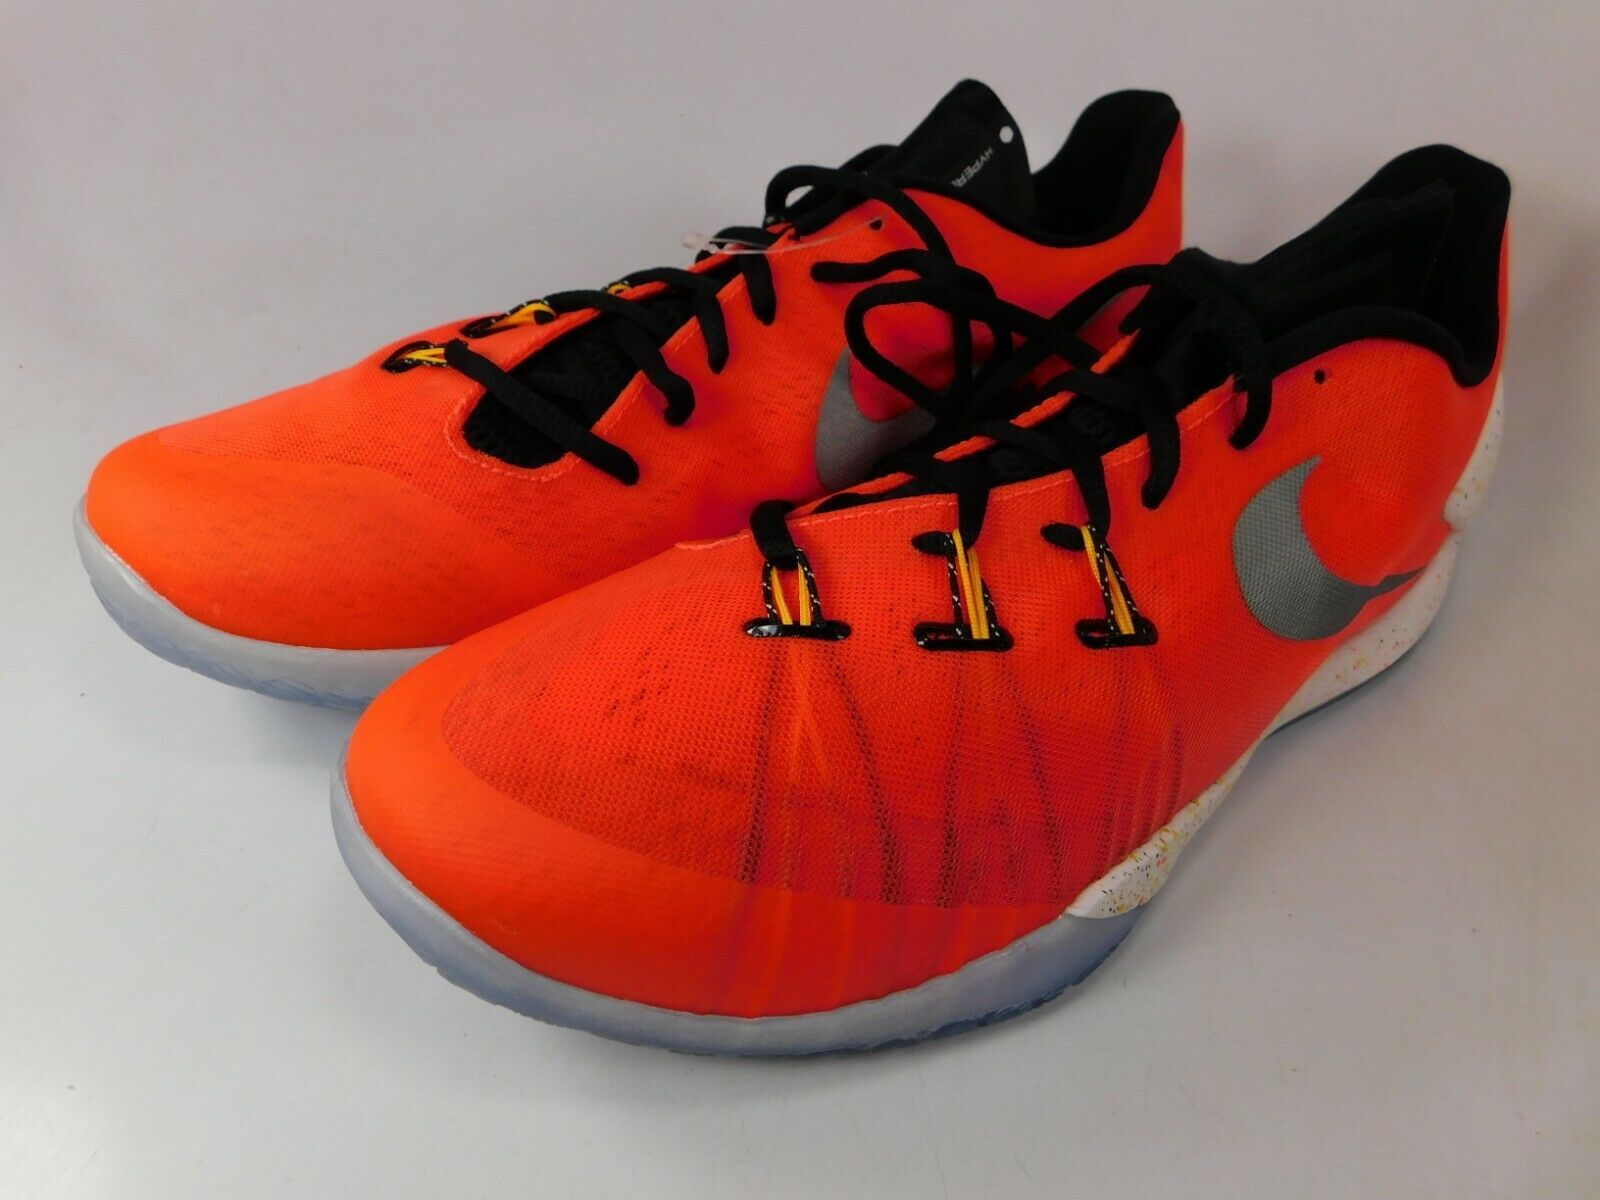 Nike Hyperchase Premium NCS Size US 12 M (D) EU 46 Men's Basketball Shoes 705369